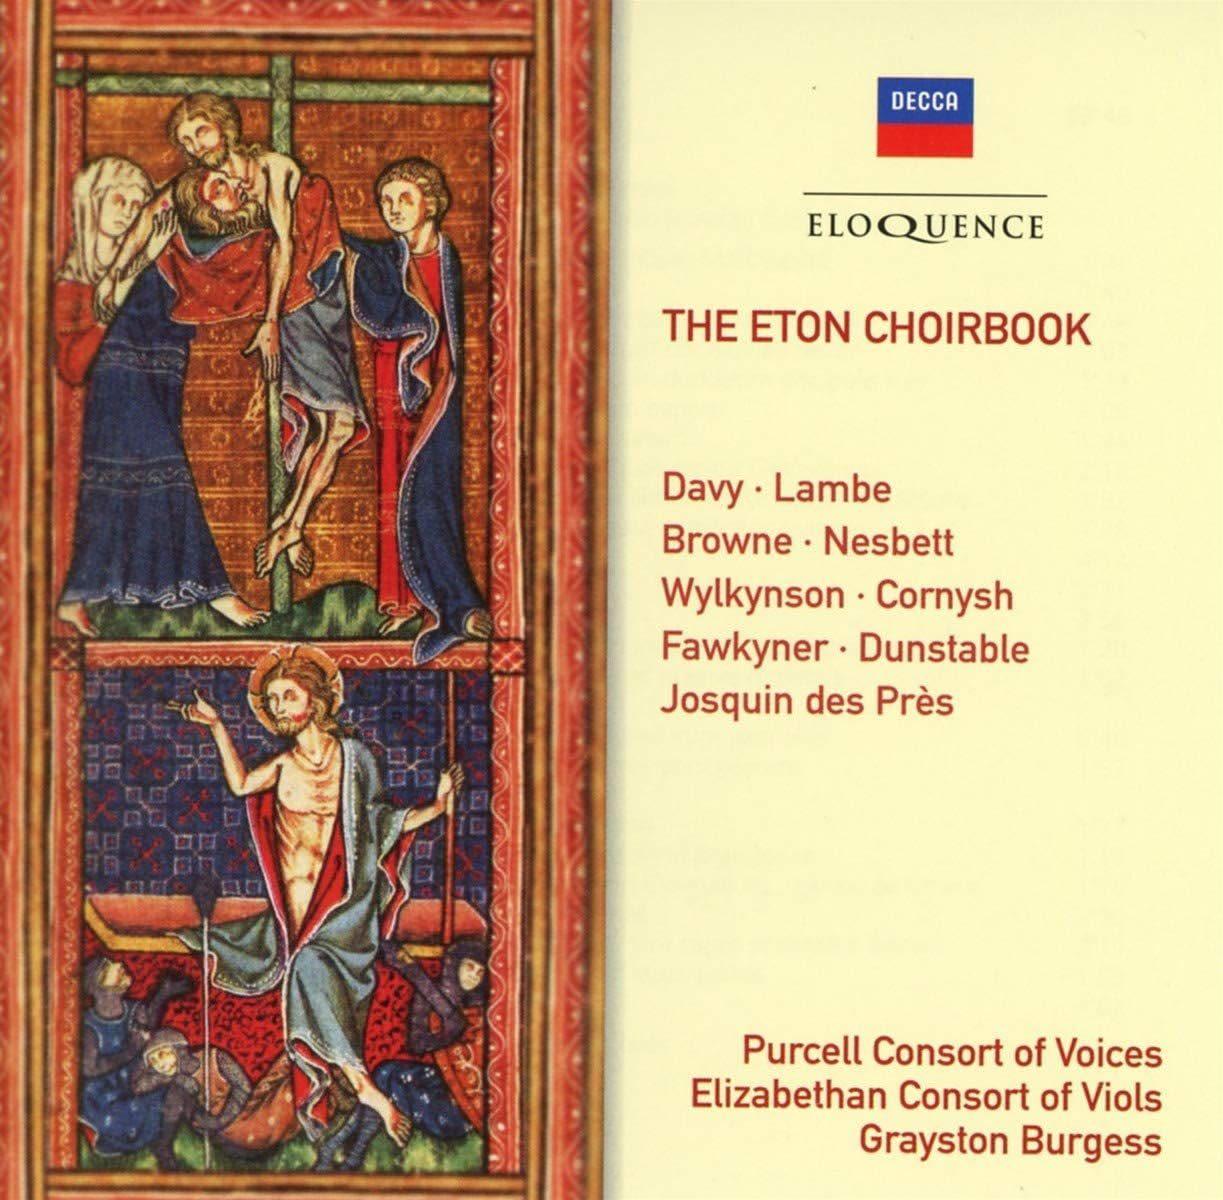 Photo No.1 of The Eton Choirbook